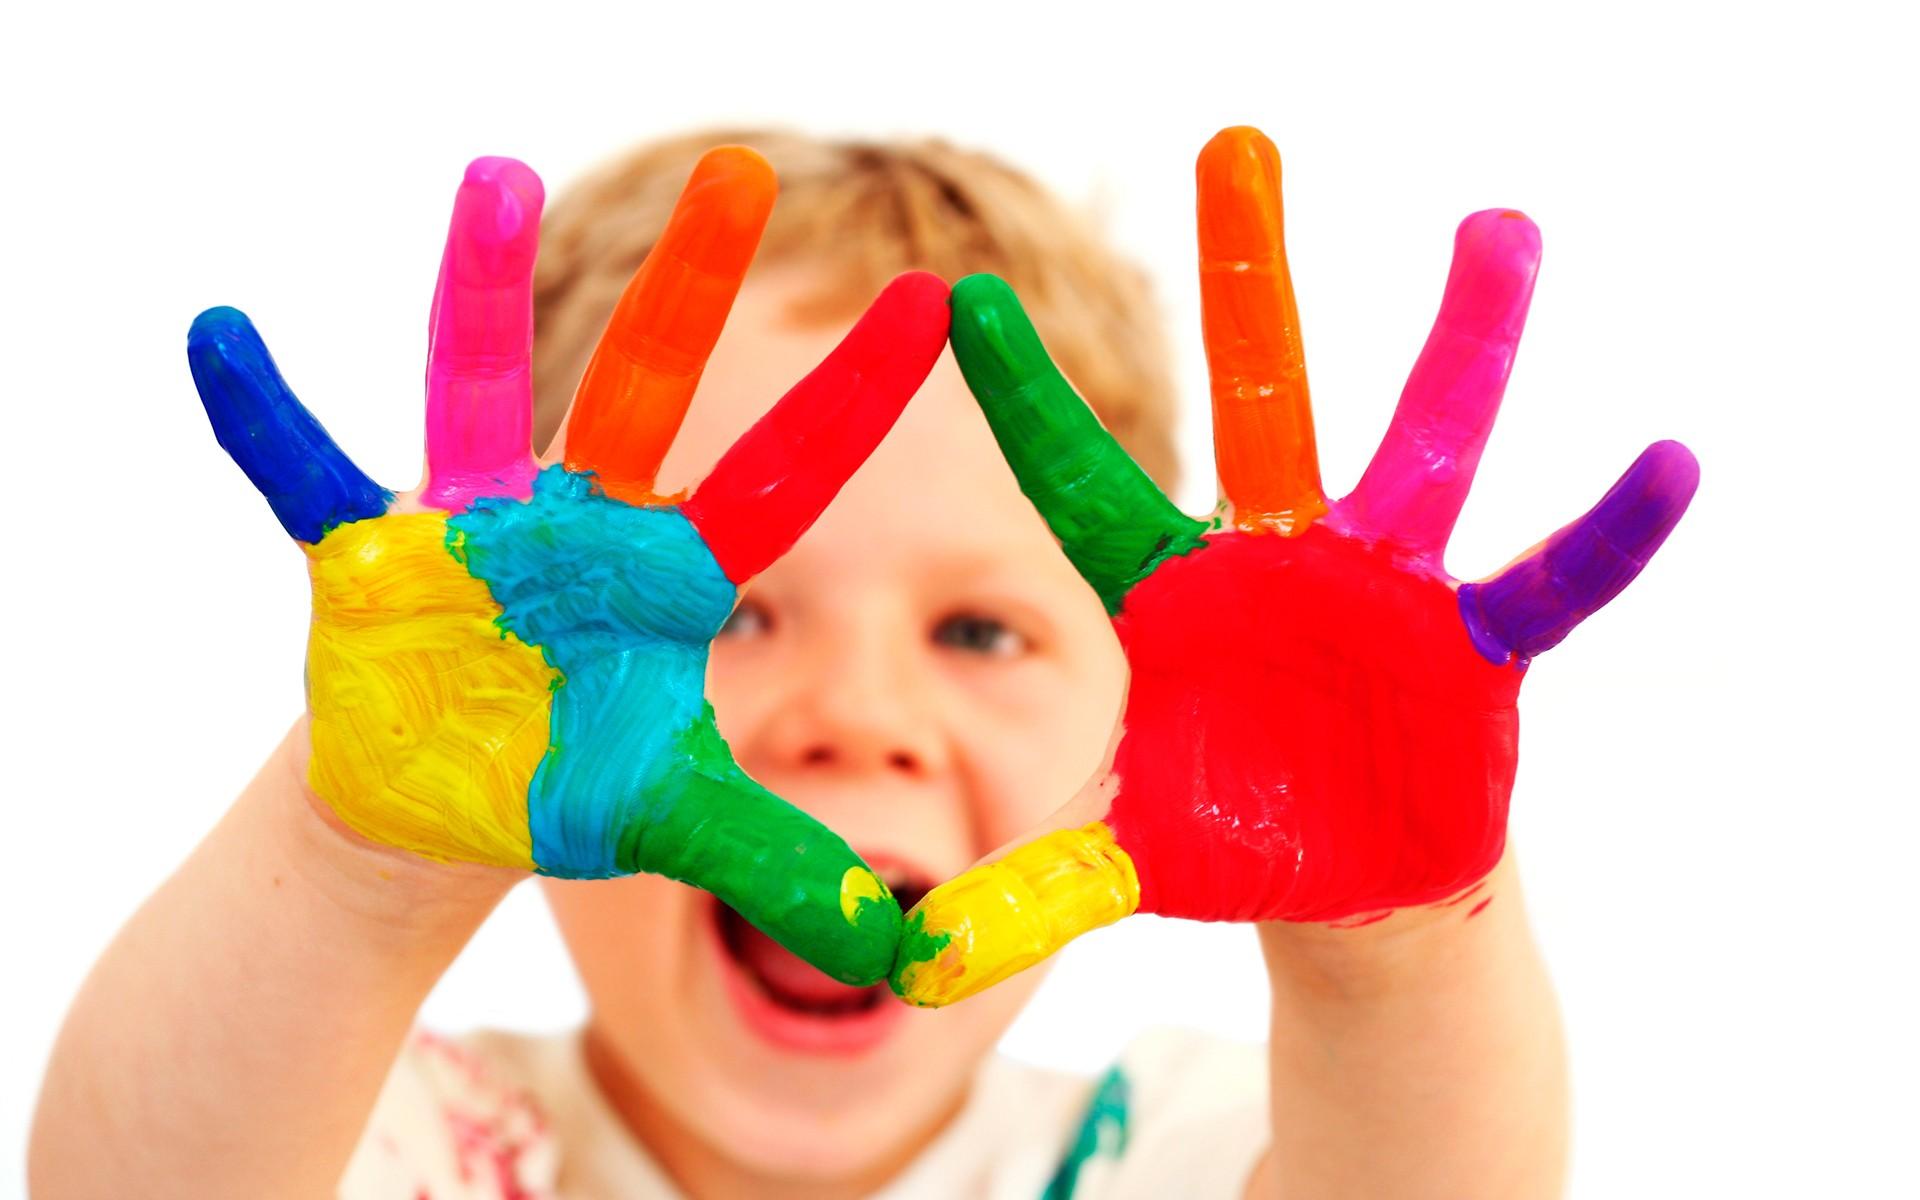 How To Make Safe Finger Paint For Kids | Idea Digezt